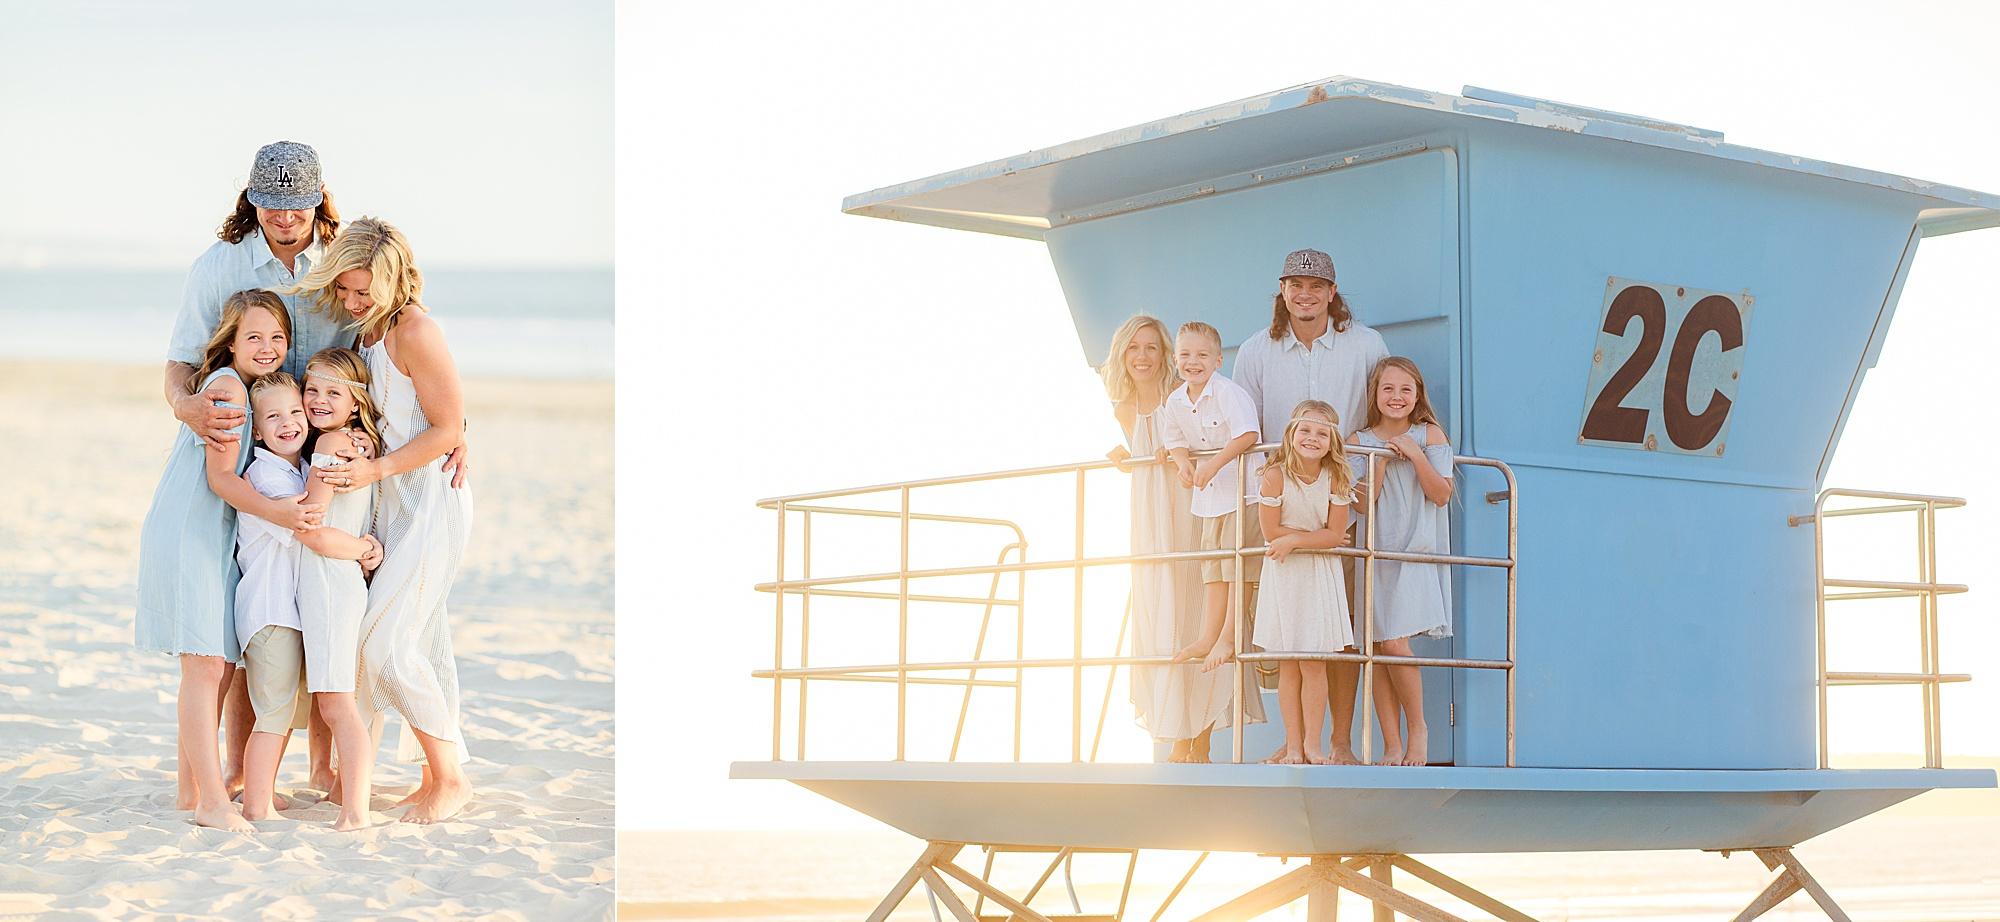 San Diego Beach Photographer | Hotel del Coronado Photography